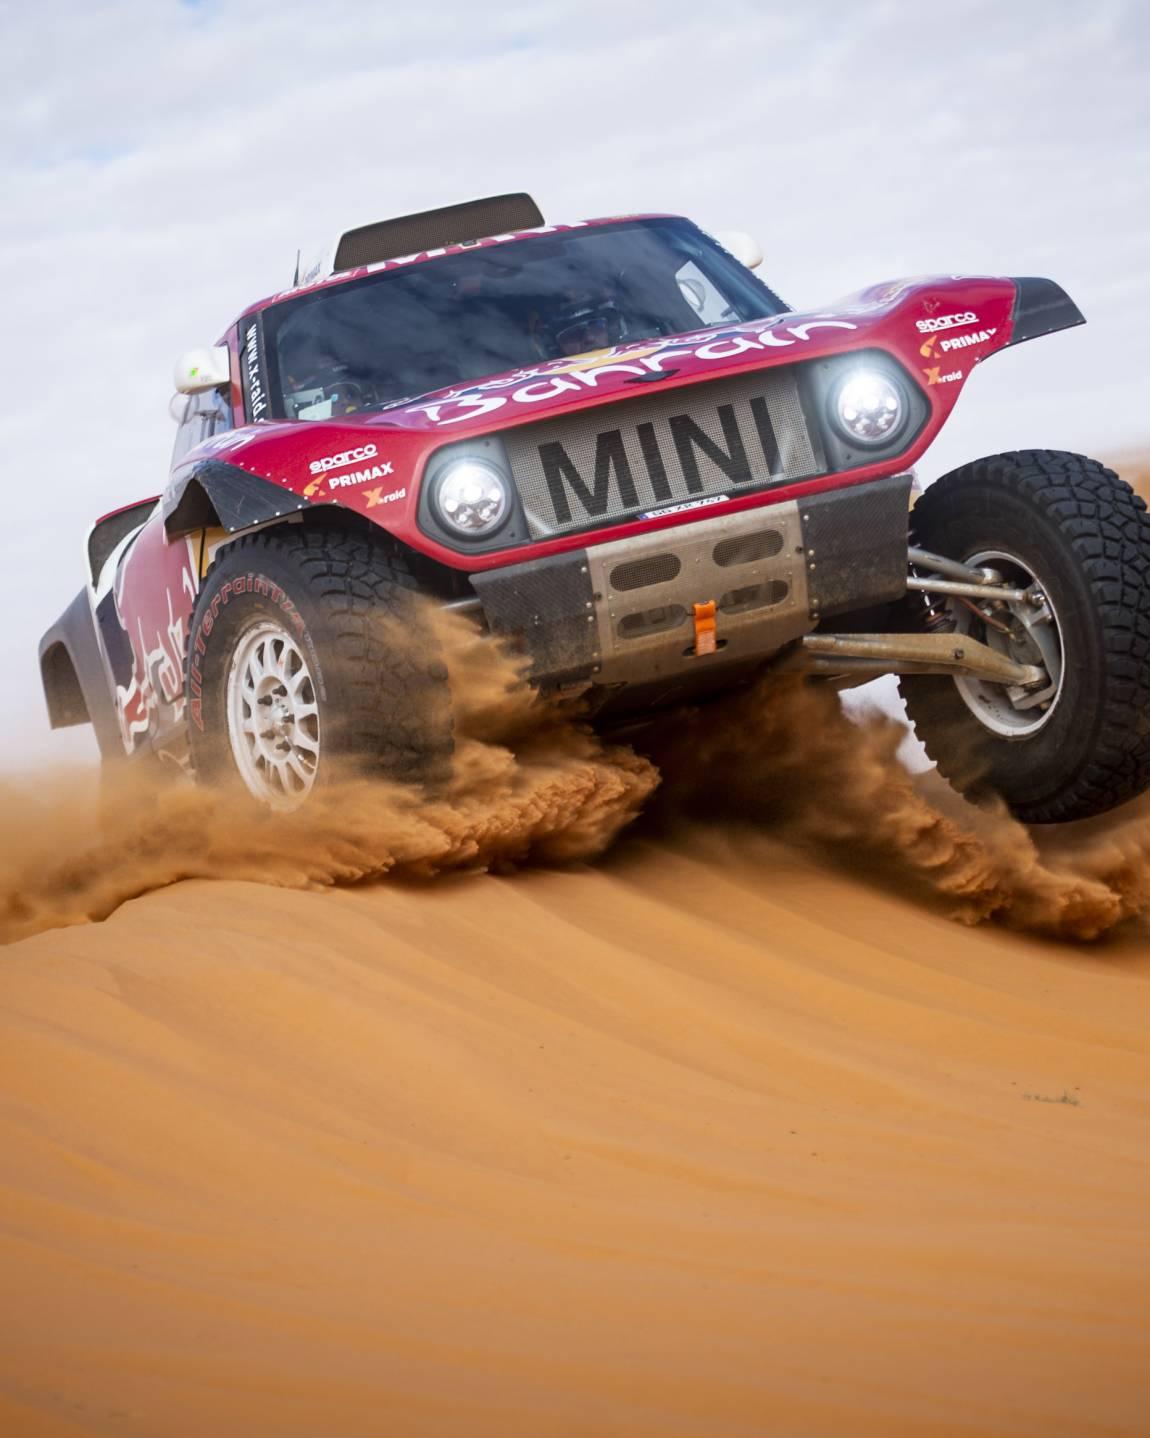 Dakar Rally 2020 Rest Day standings and news 1150x1438